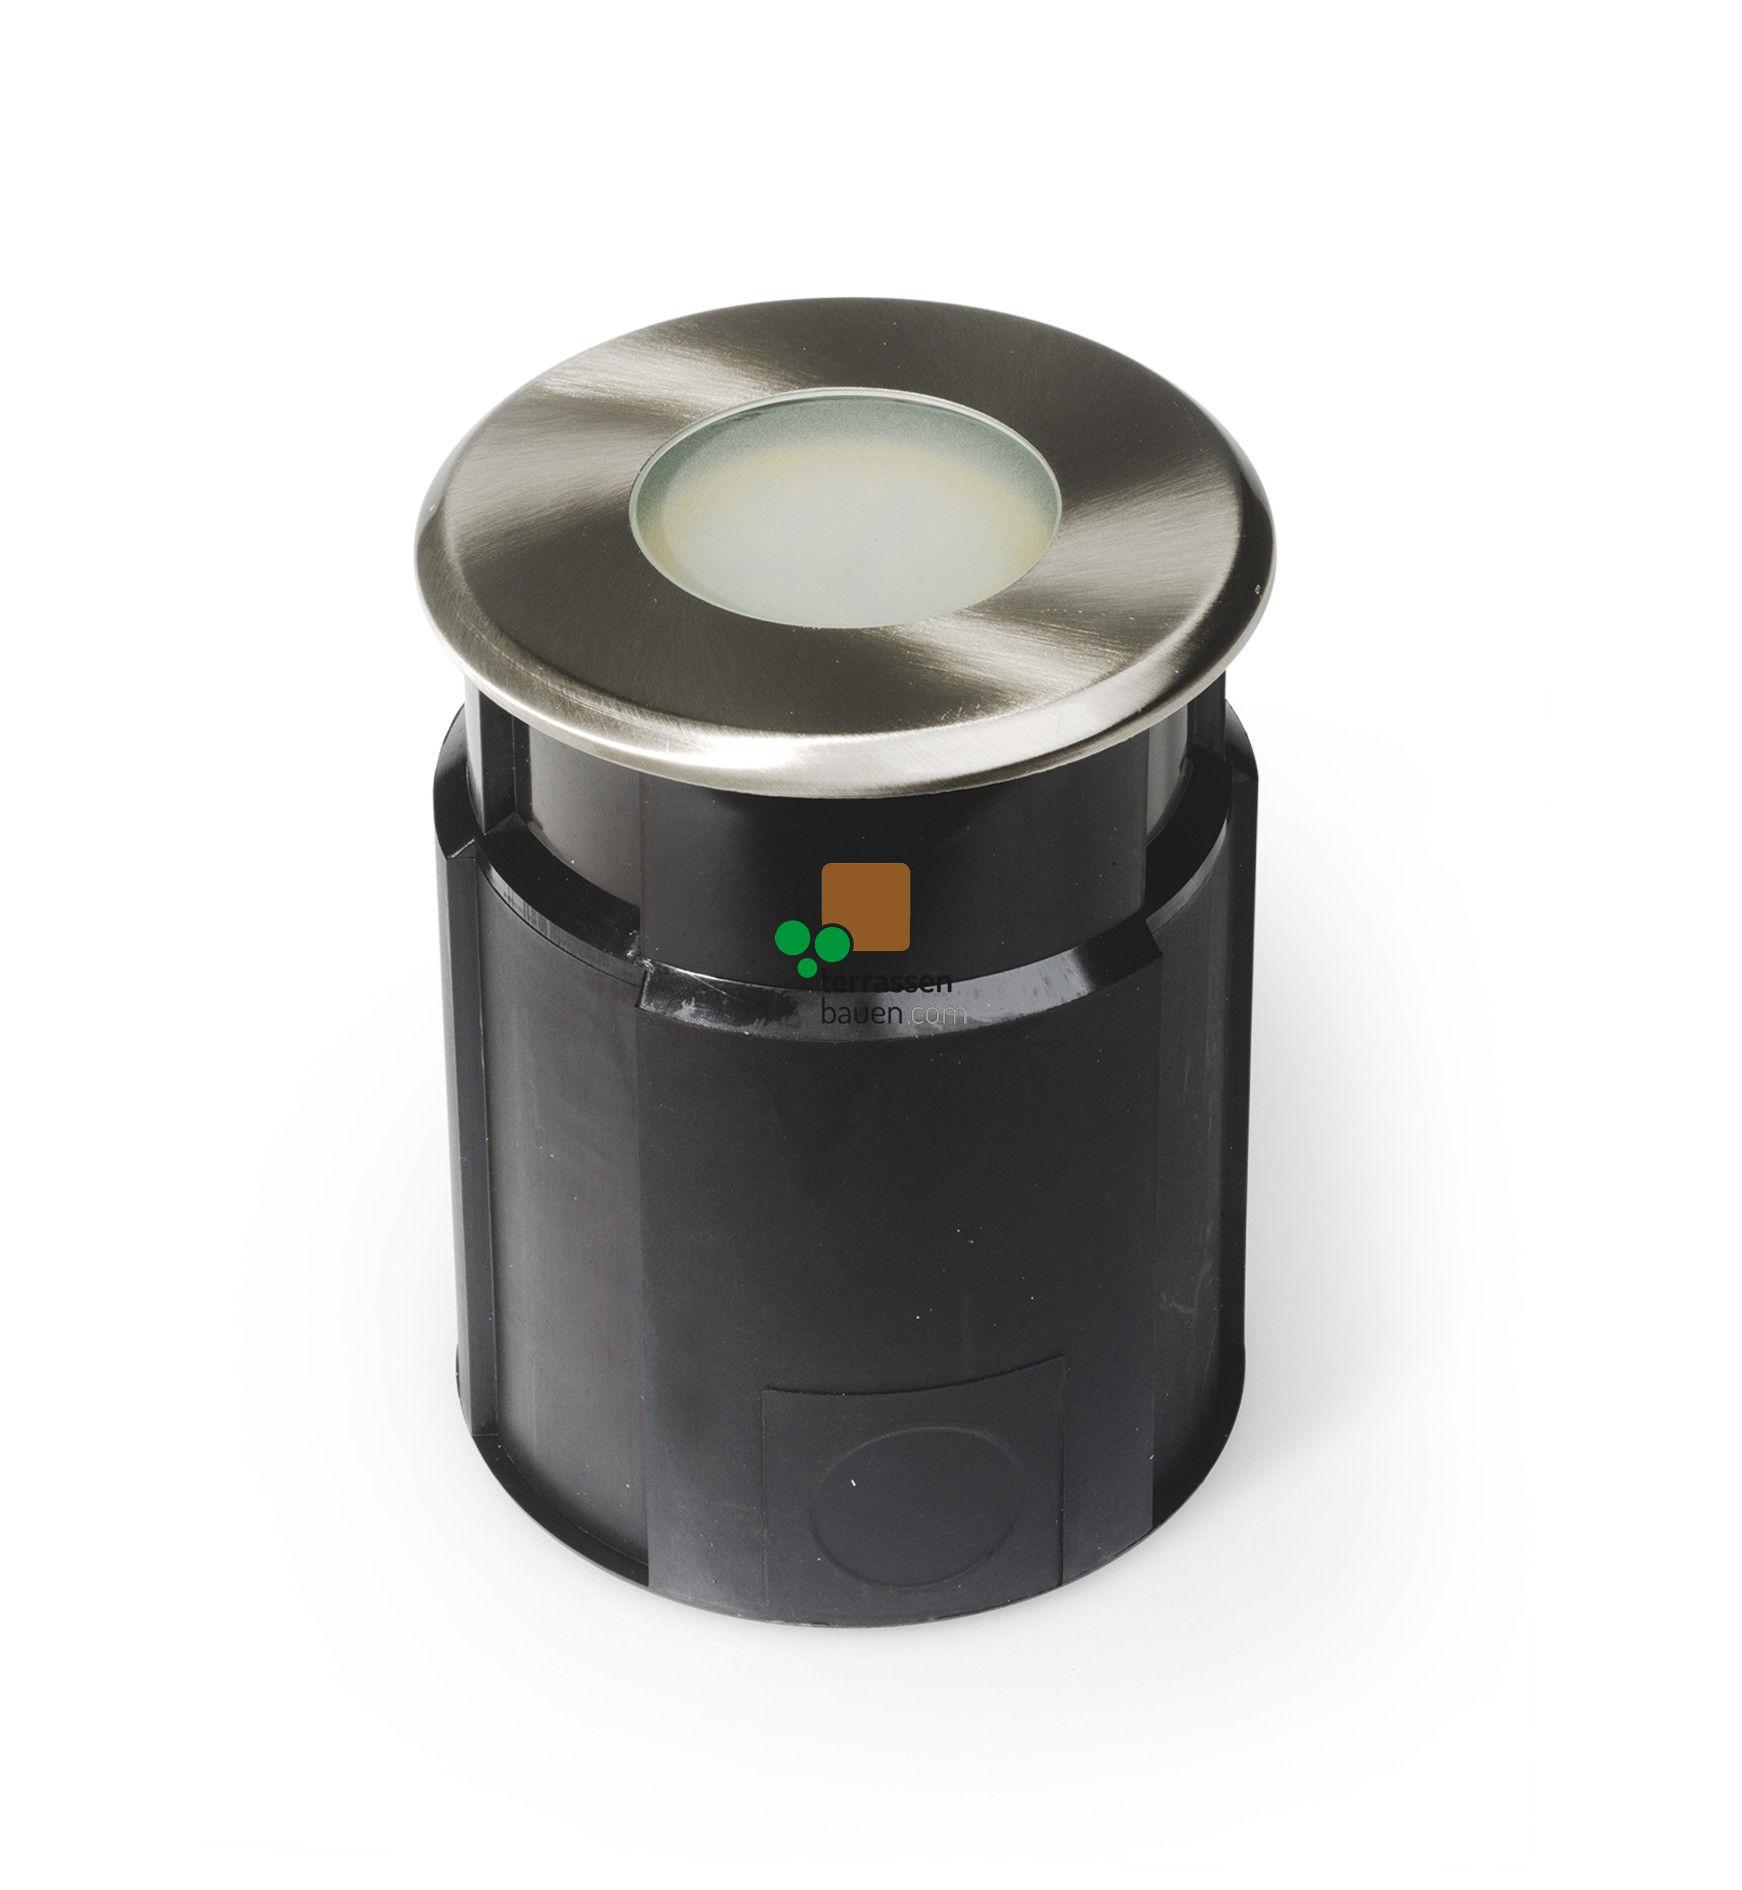 EasyConnect Edelstahl LED Bodenleuchte ø 120mm, 230VAC, 1 Stück